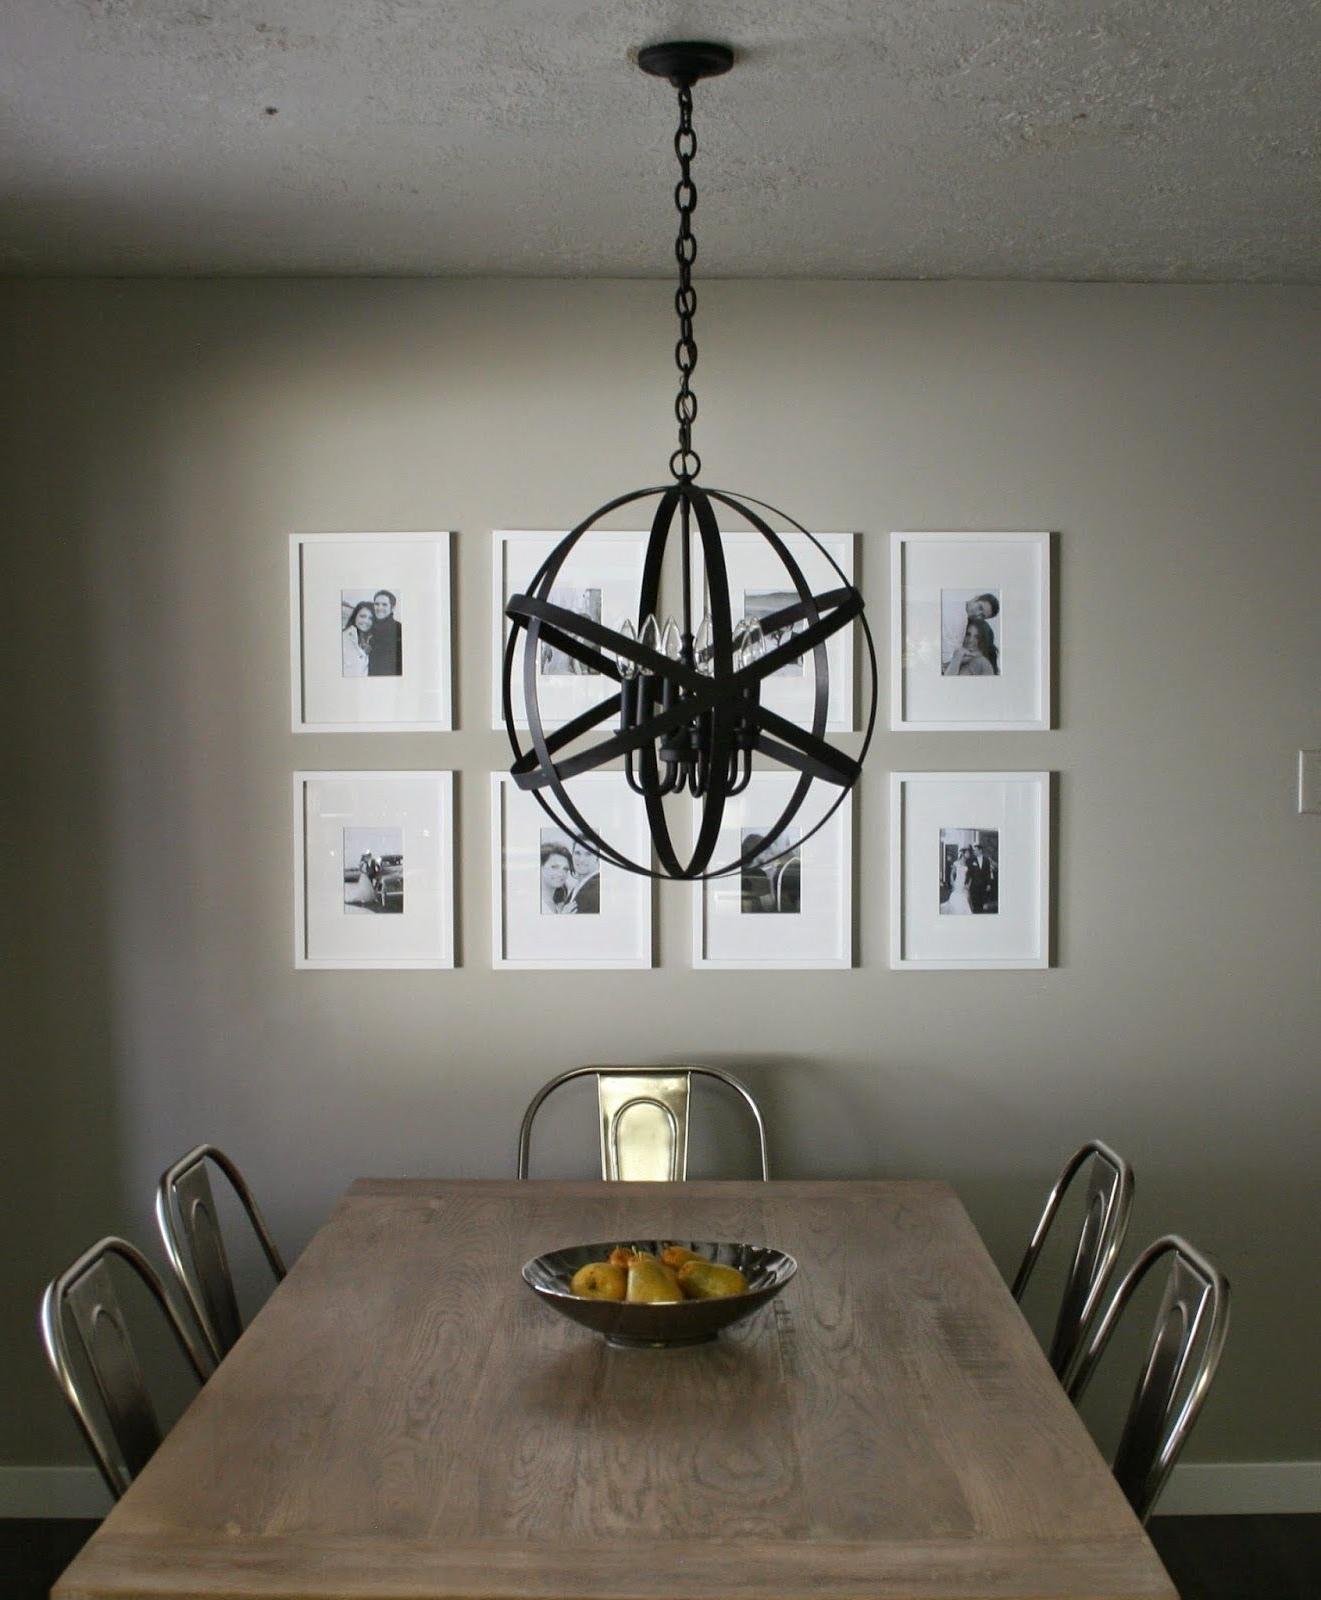 Orb Chandeliers Throughout Most Current Andrea West Design Blog: Diy Designer Black Orb Chandelier (View 11 of 20)